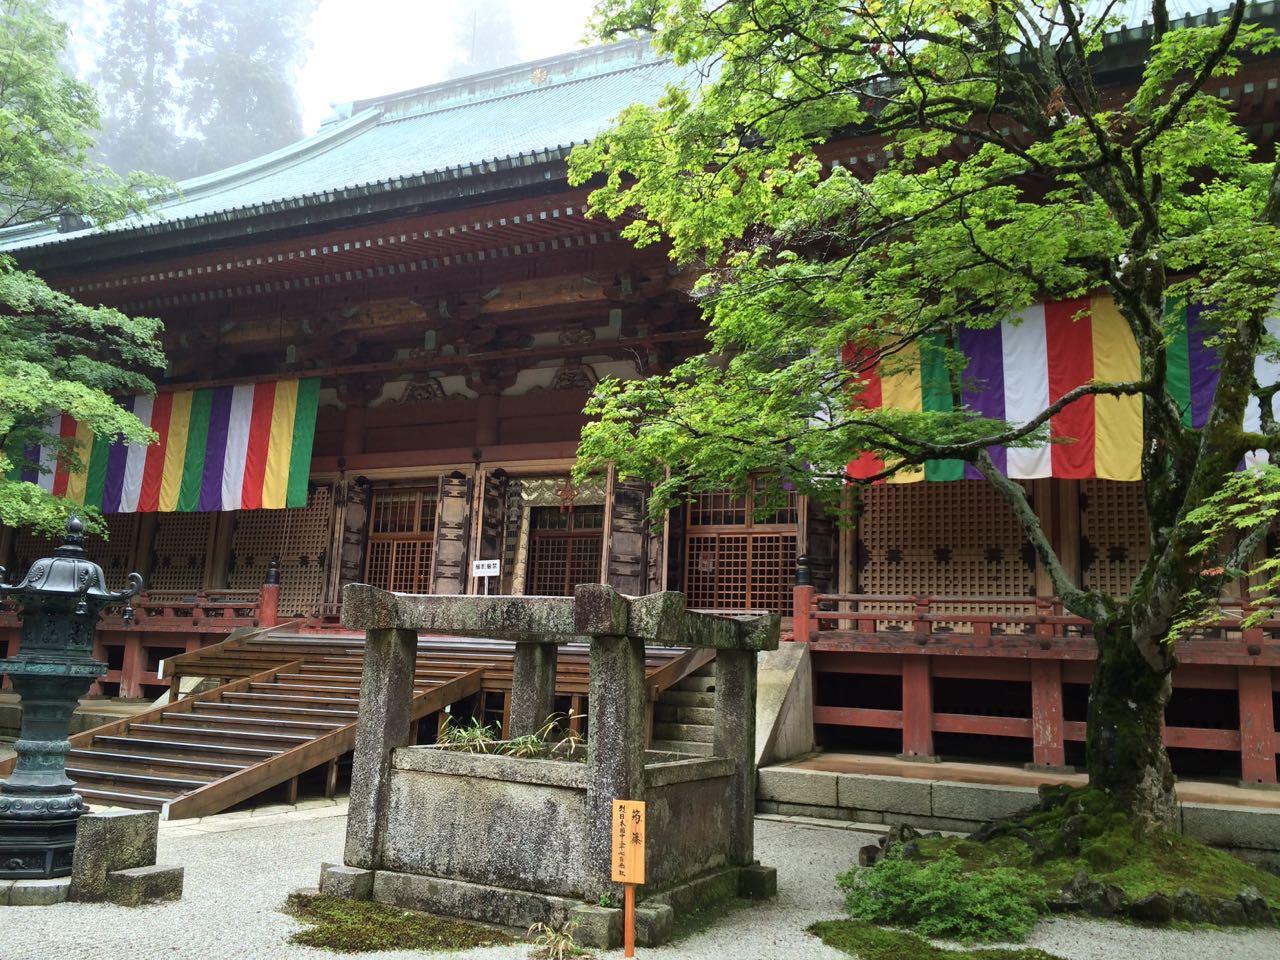 Major hall at Enryaku-ji